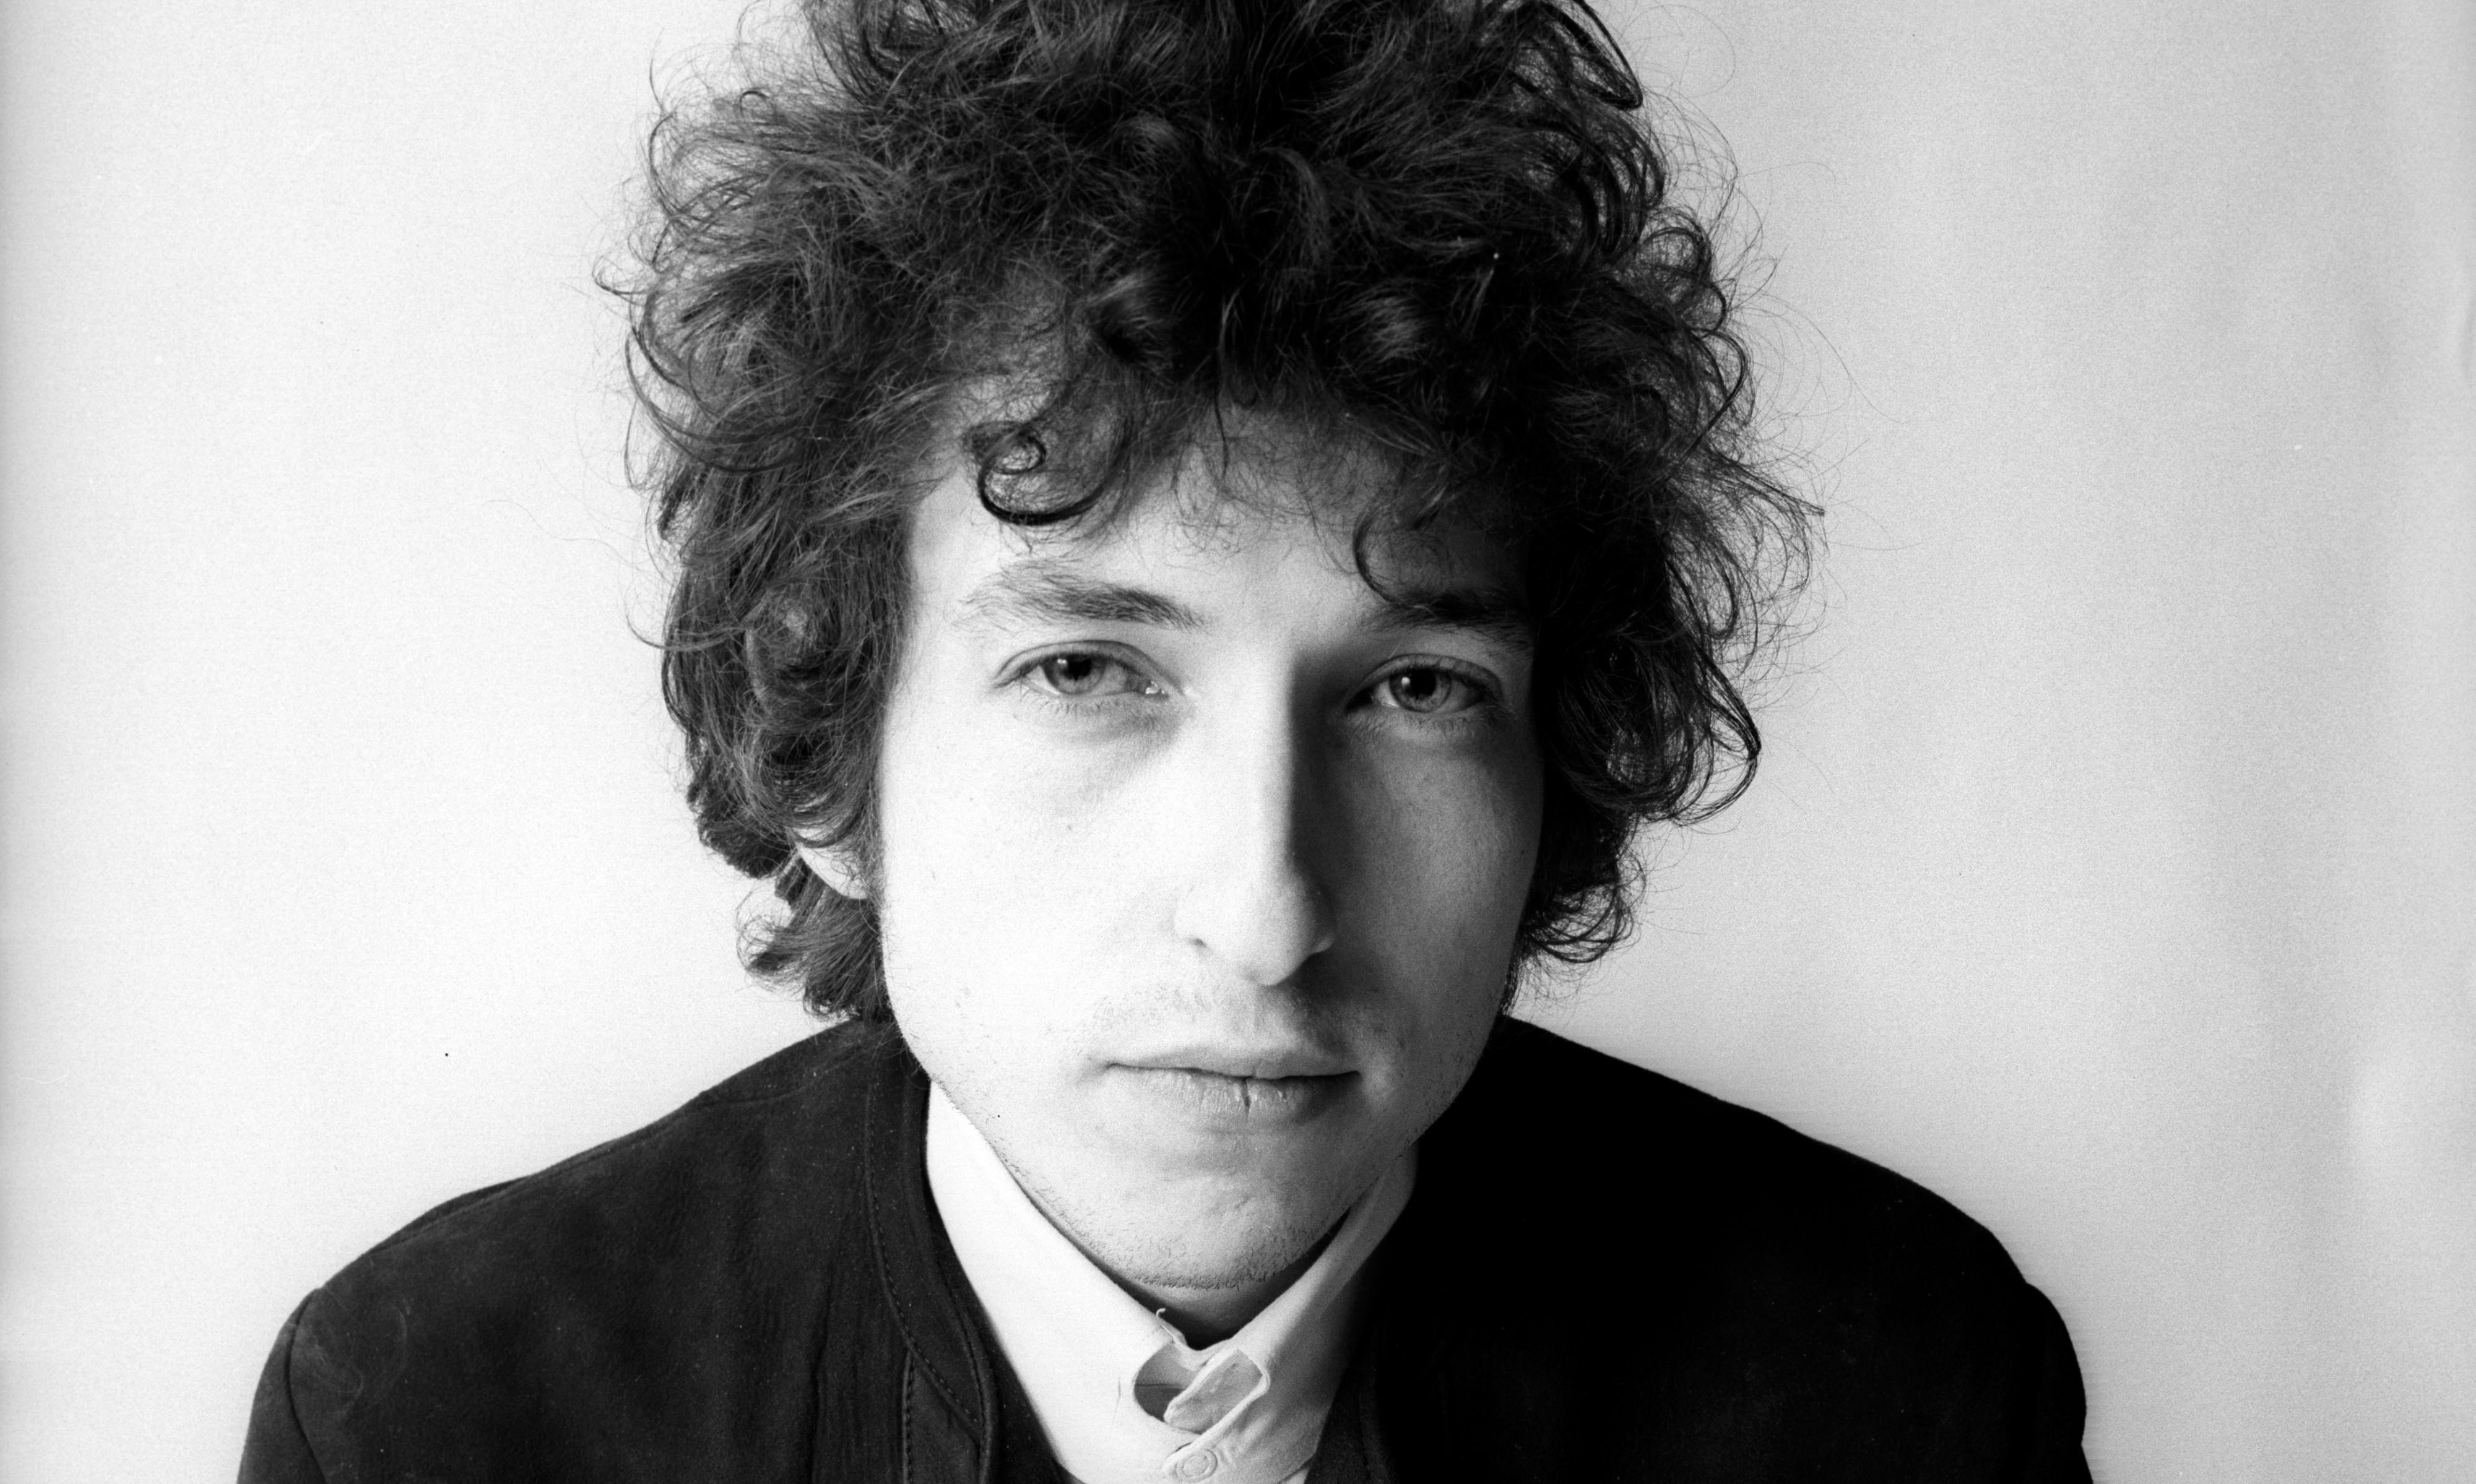 Bob Dylan & His Creative Process. Steve Jobs took some heat when he said… |  by Alex Kliman | Medium